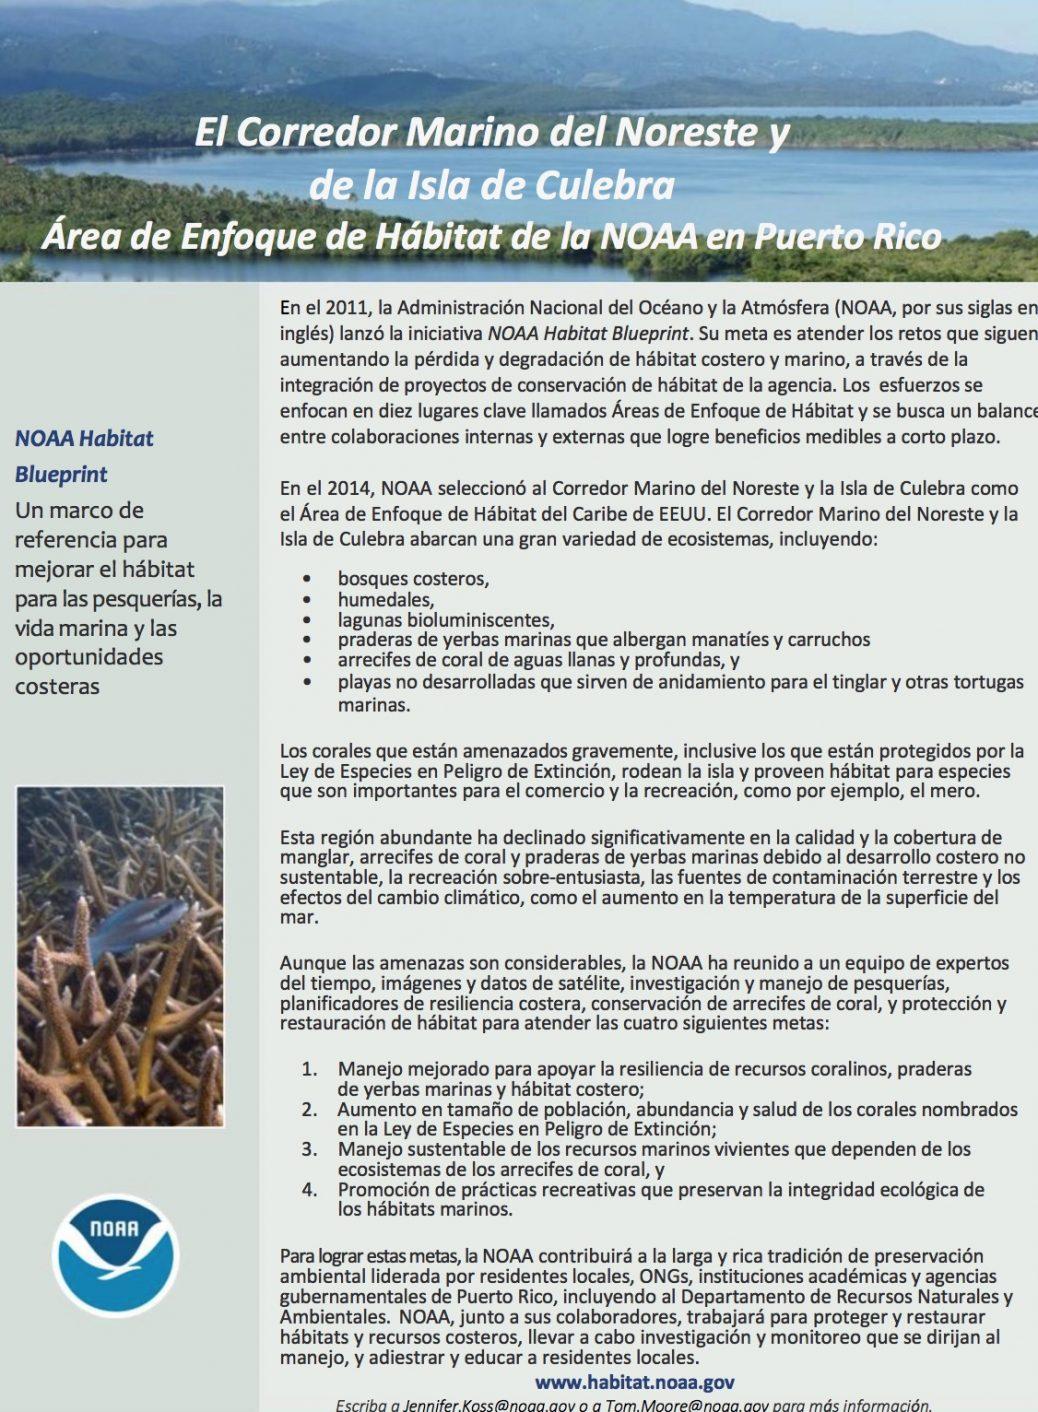 Noaa habitat blueprint puerto rico sea grant college program noaa habitat blueprint malvernweather Gallery